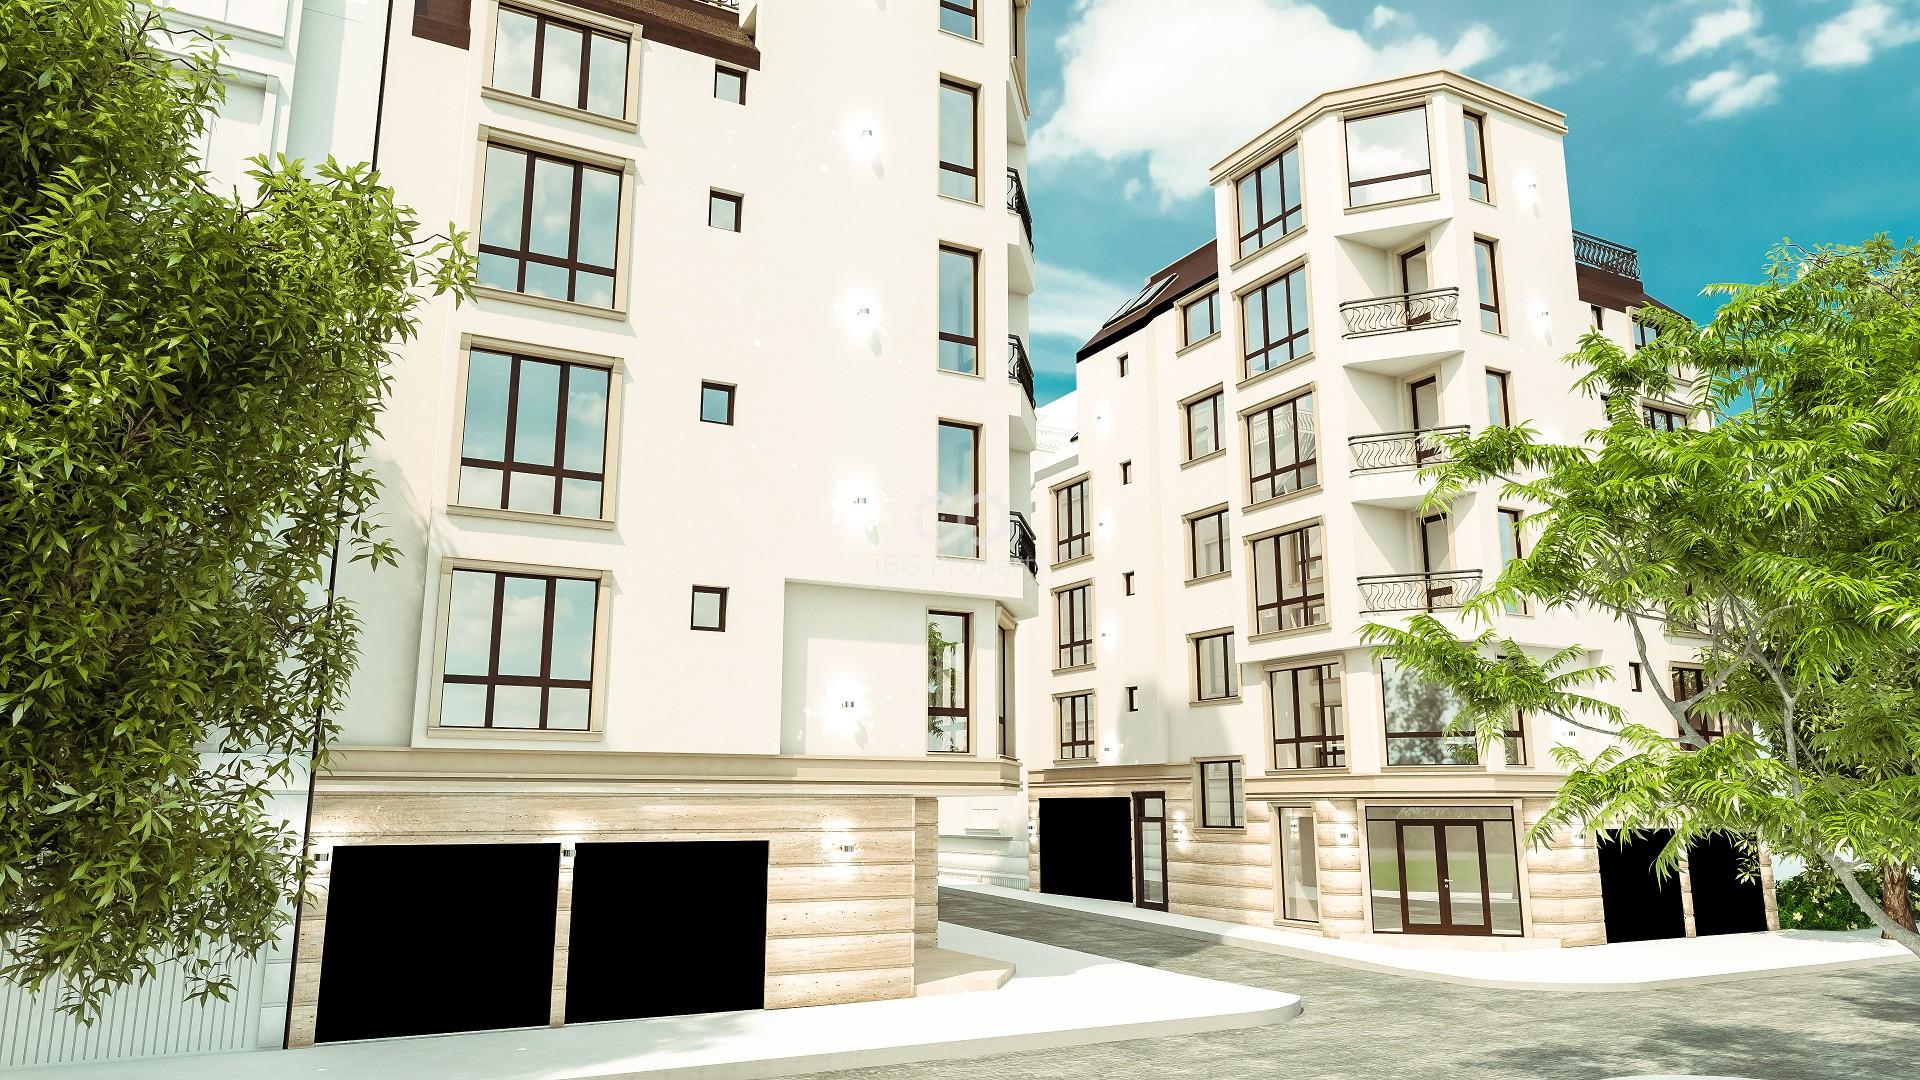 Тристаен апартамент Колхозен пазар Варна 72,12 m2